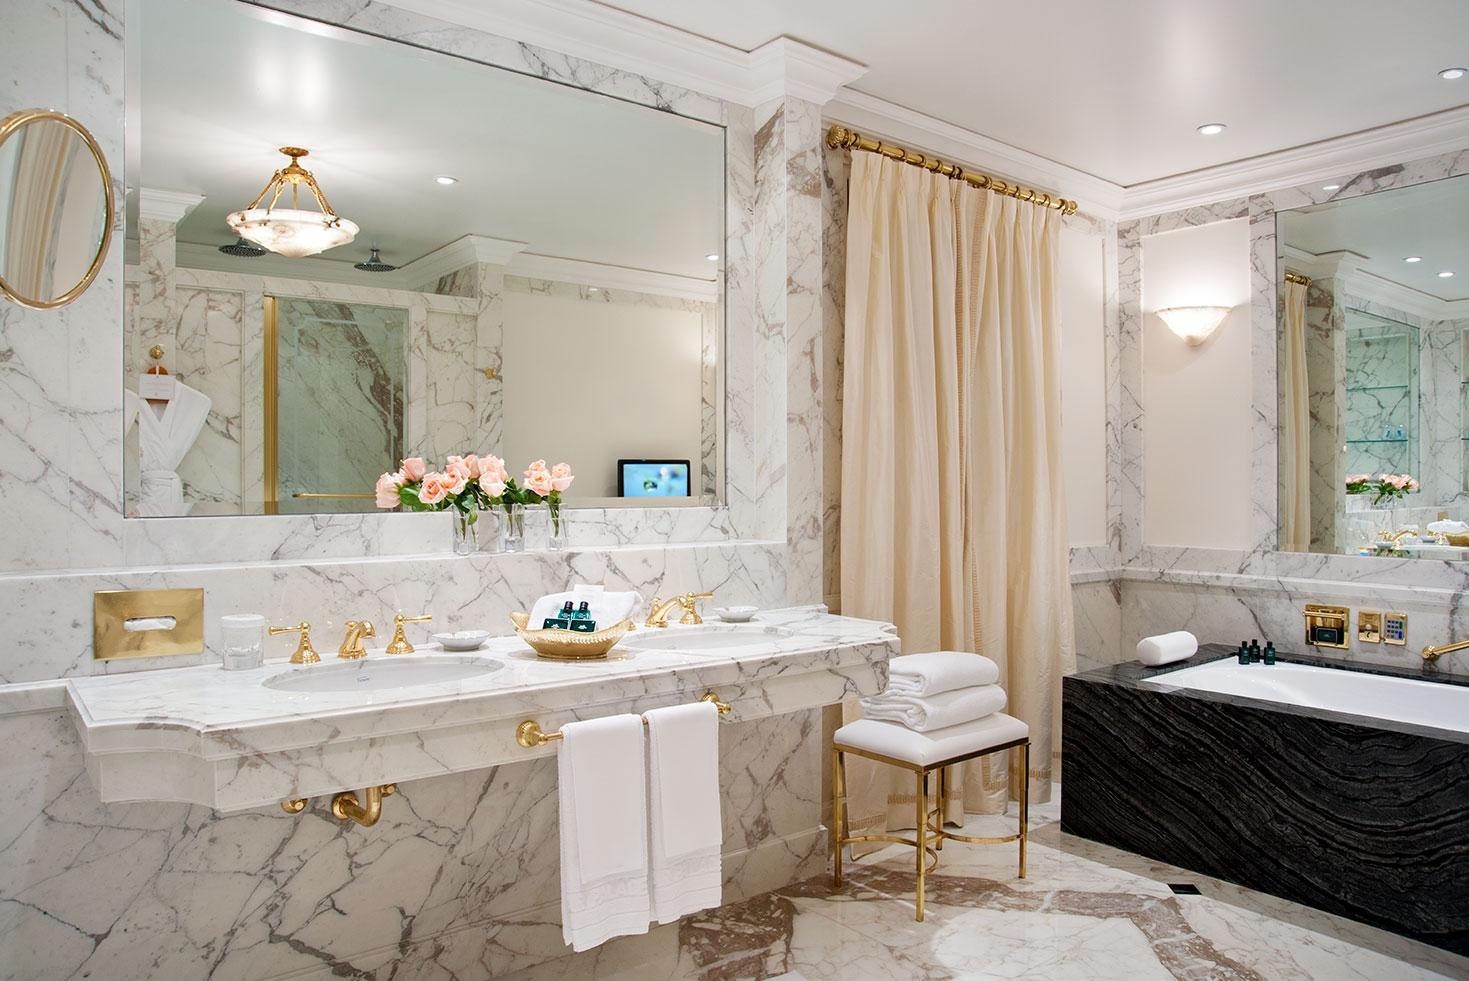 Alvear Palace Hotel Room Royal Suite